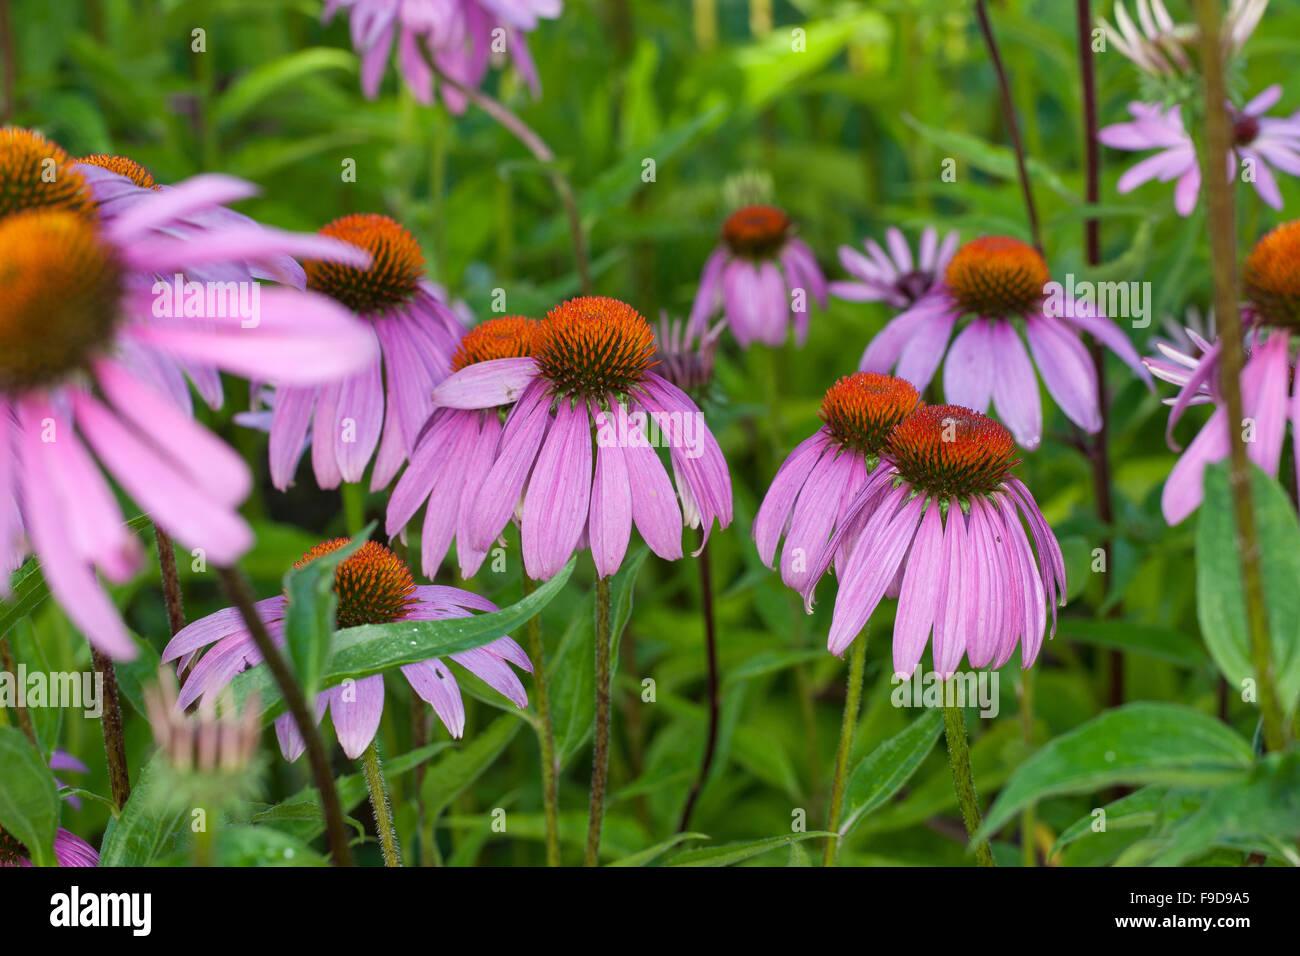 Purple Cone Flower, coneflower, Roter Sonnenhut, Purpur-Sonnenhut, Echinacea purpurea, Rudbeckia purpurea, Brauneria - Stock Image